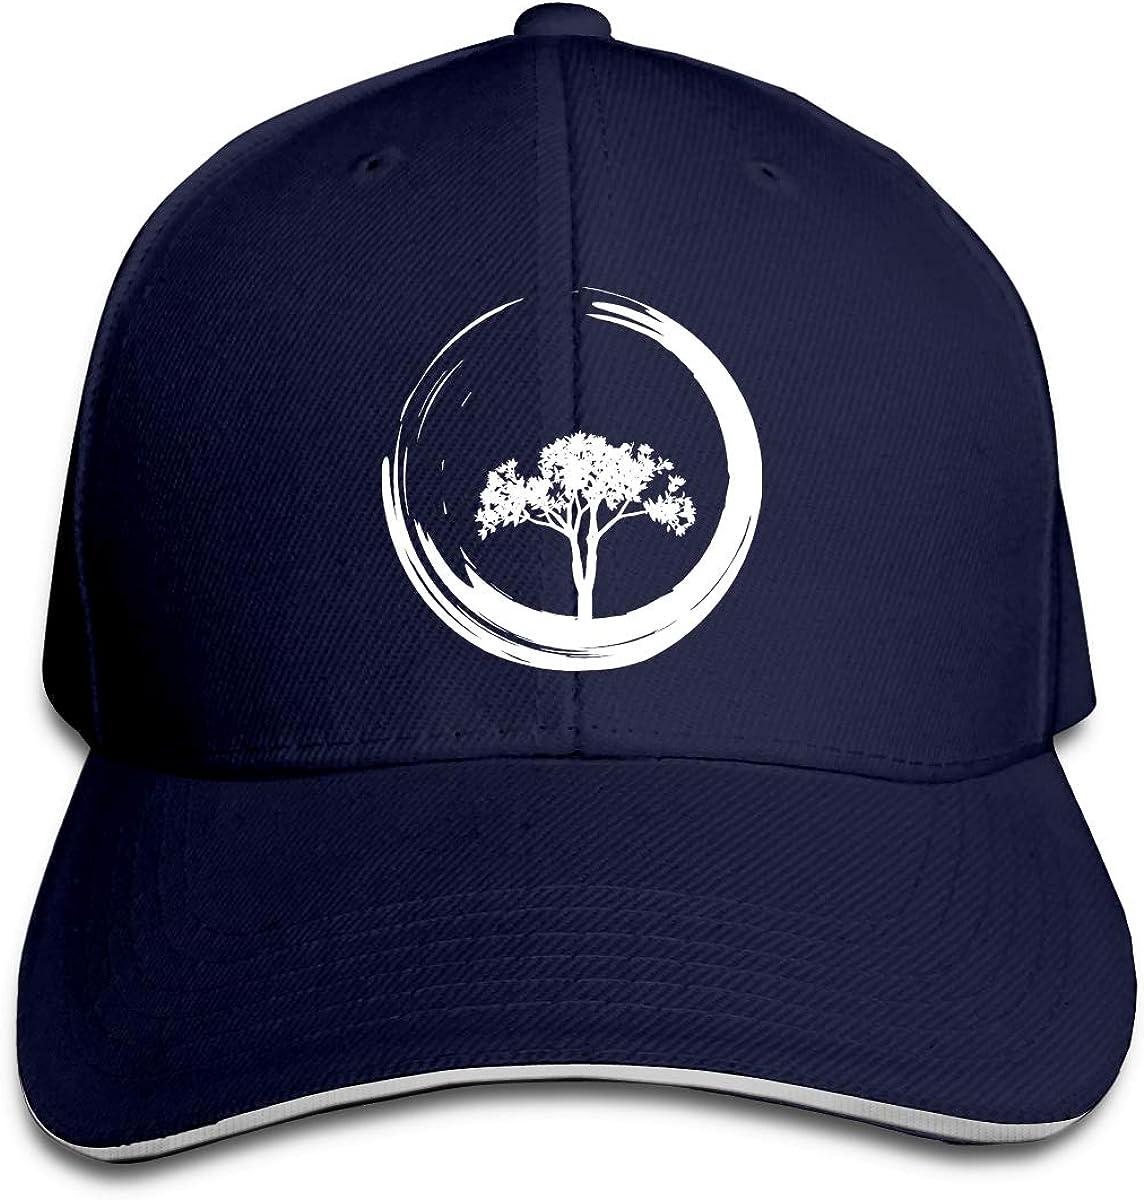 Yin Yang Classic Baseball Caps For Unisex Casual Great For Travle Hiking Visor Hats